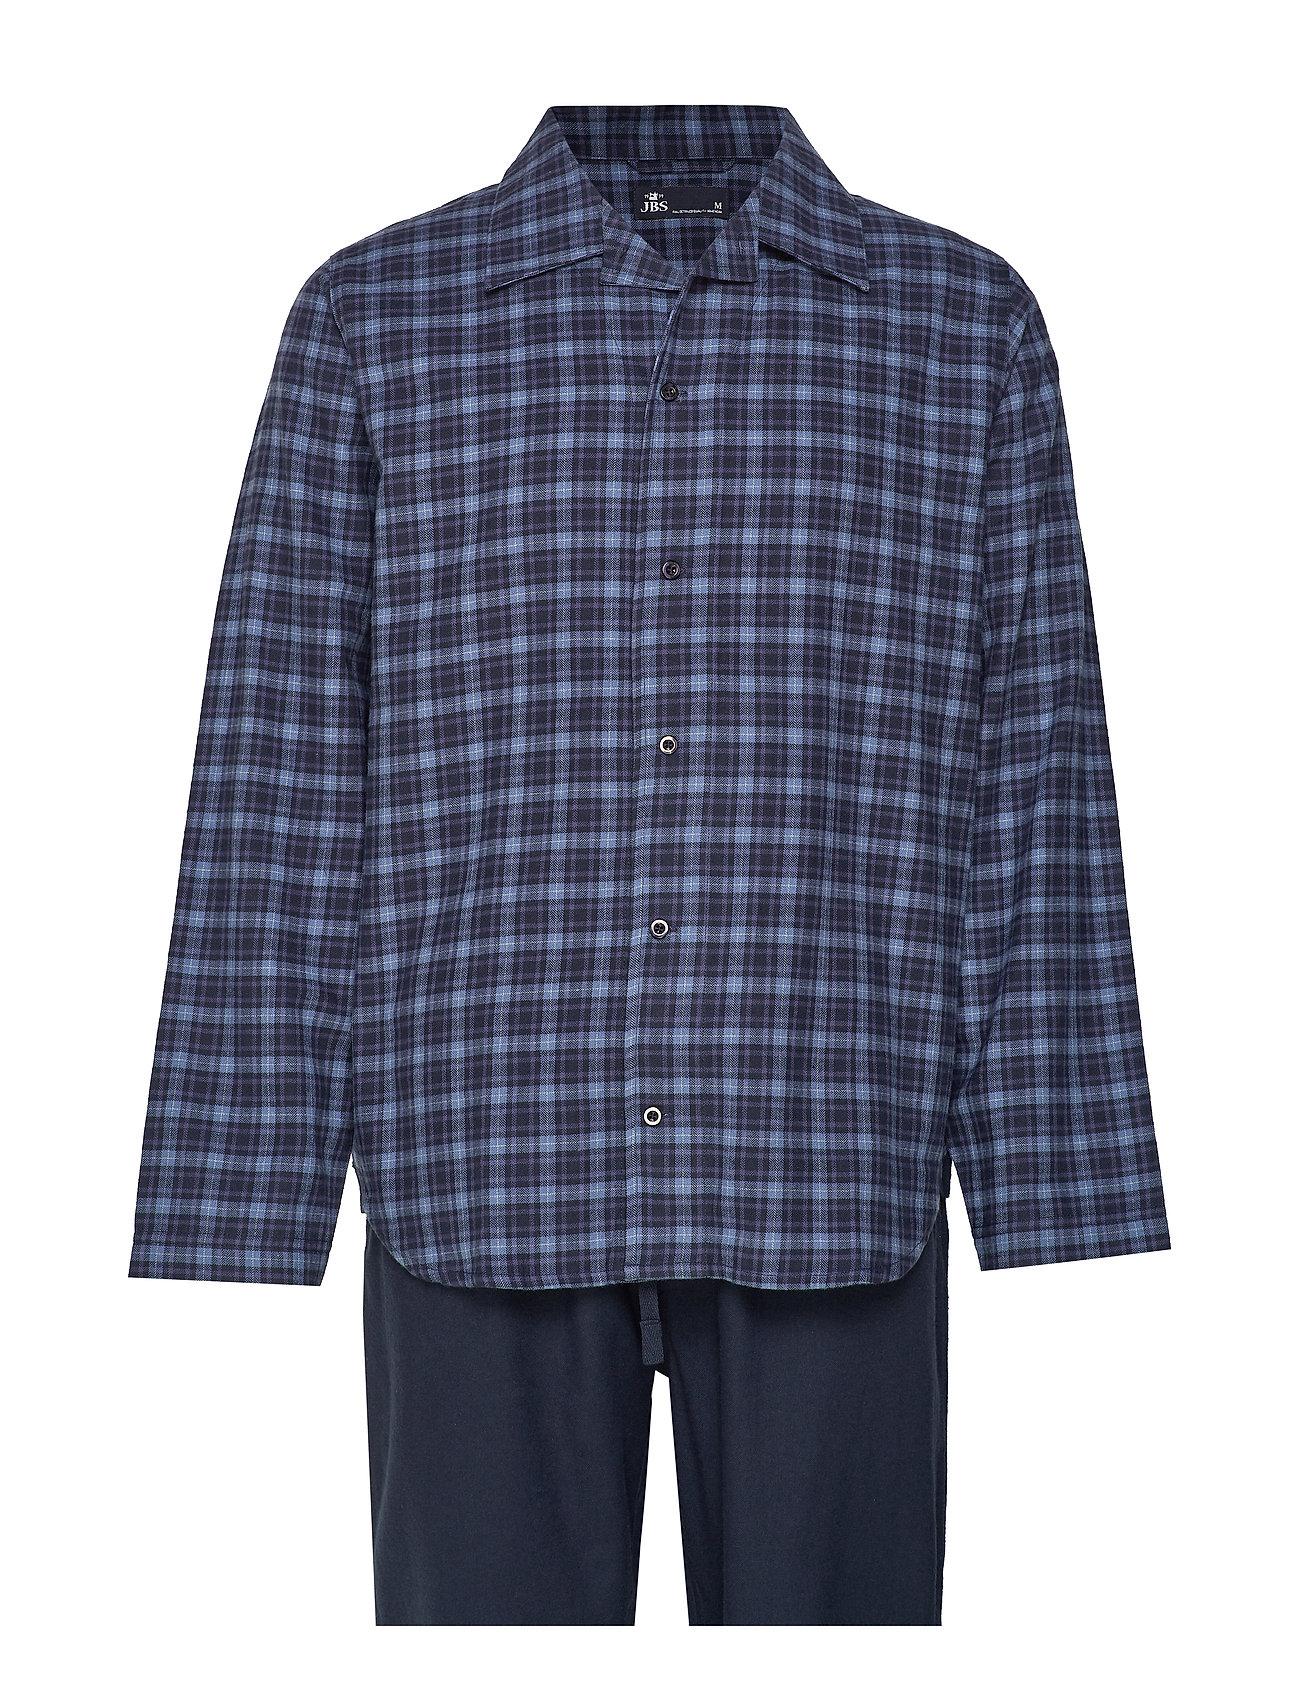 JBS JBS pyjamas flannel - BLUE CHECK